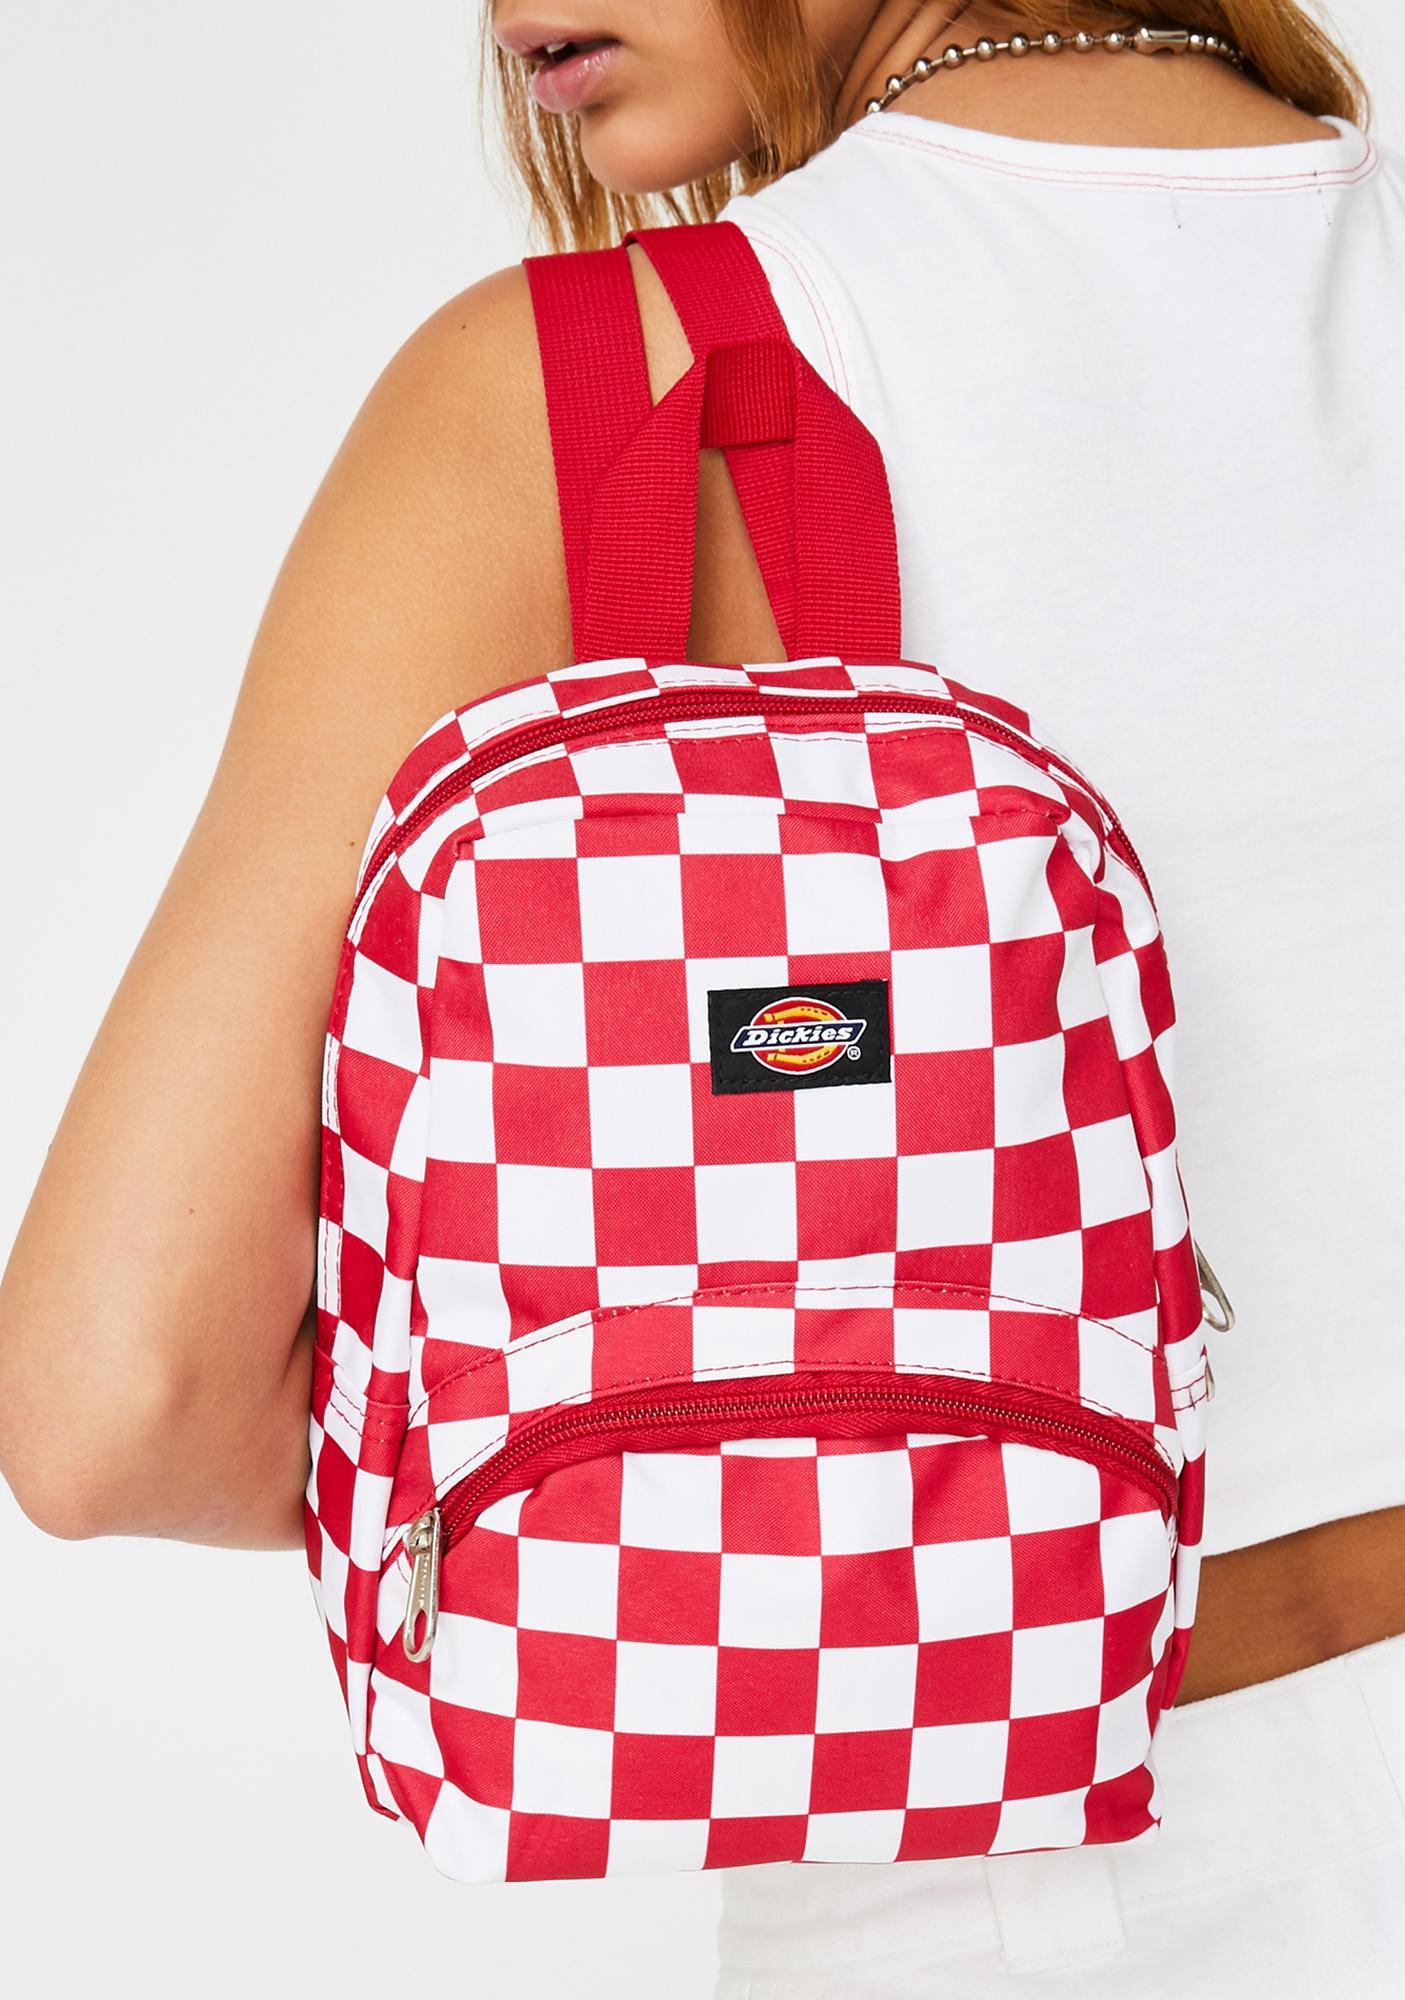 Dickies Red Checkerboard Mini Backpack